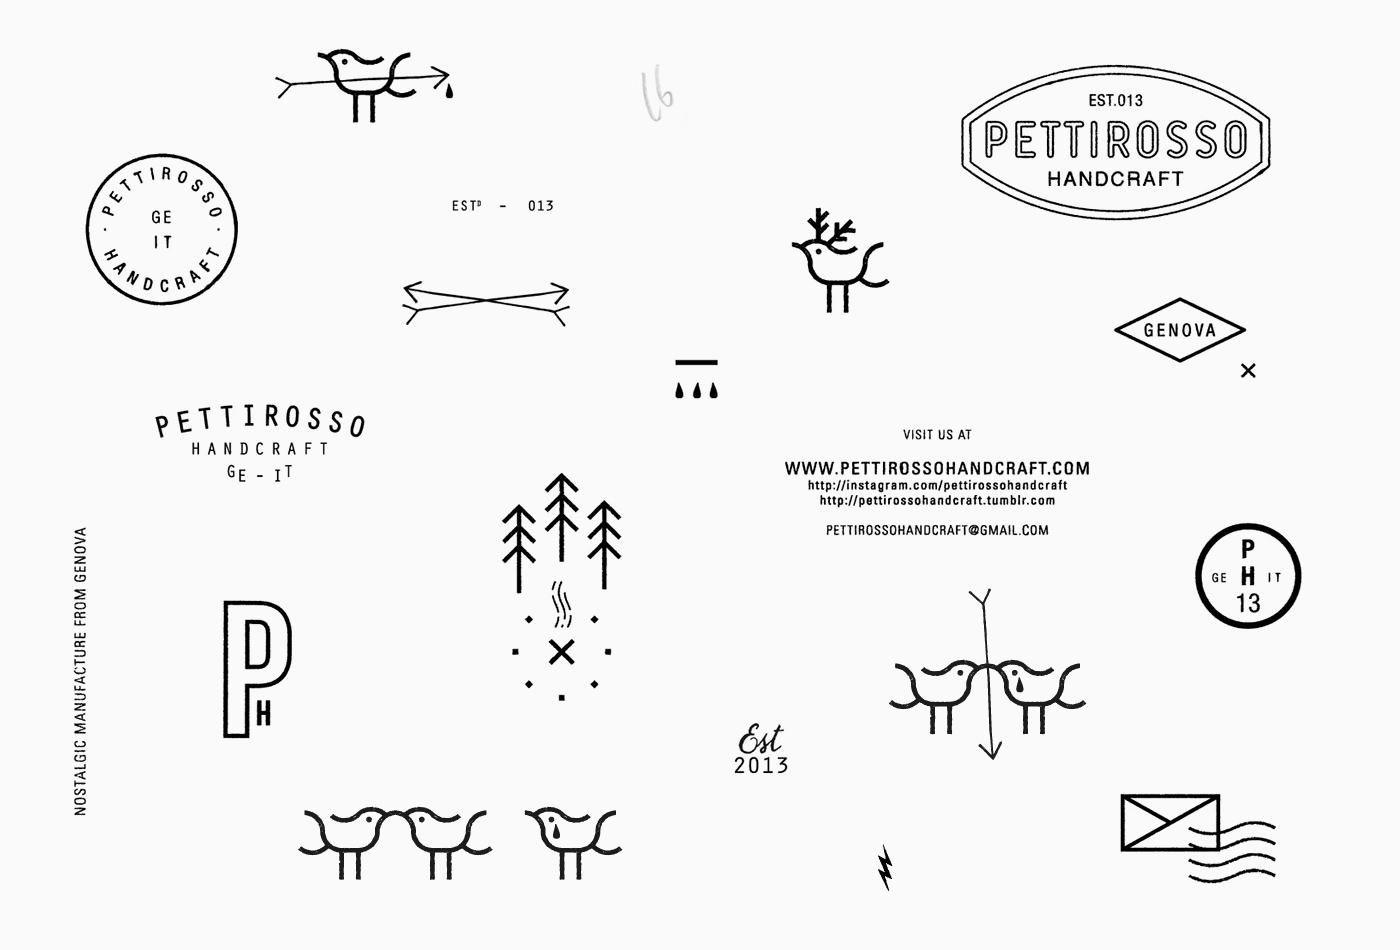 01-pettirosso-handcraft-graphic-design-wallet-bird-branding-brand-vacaliebres